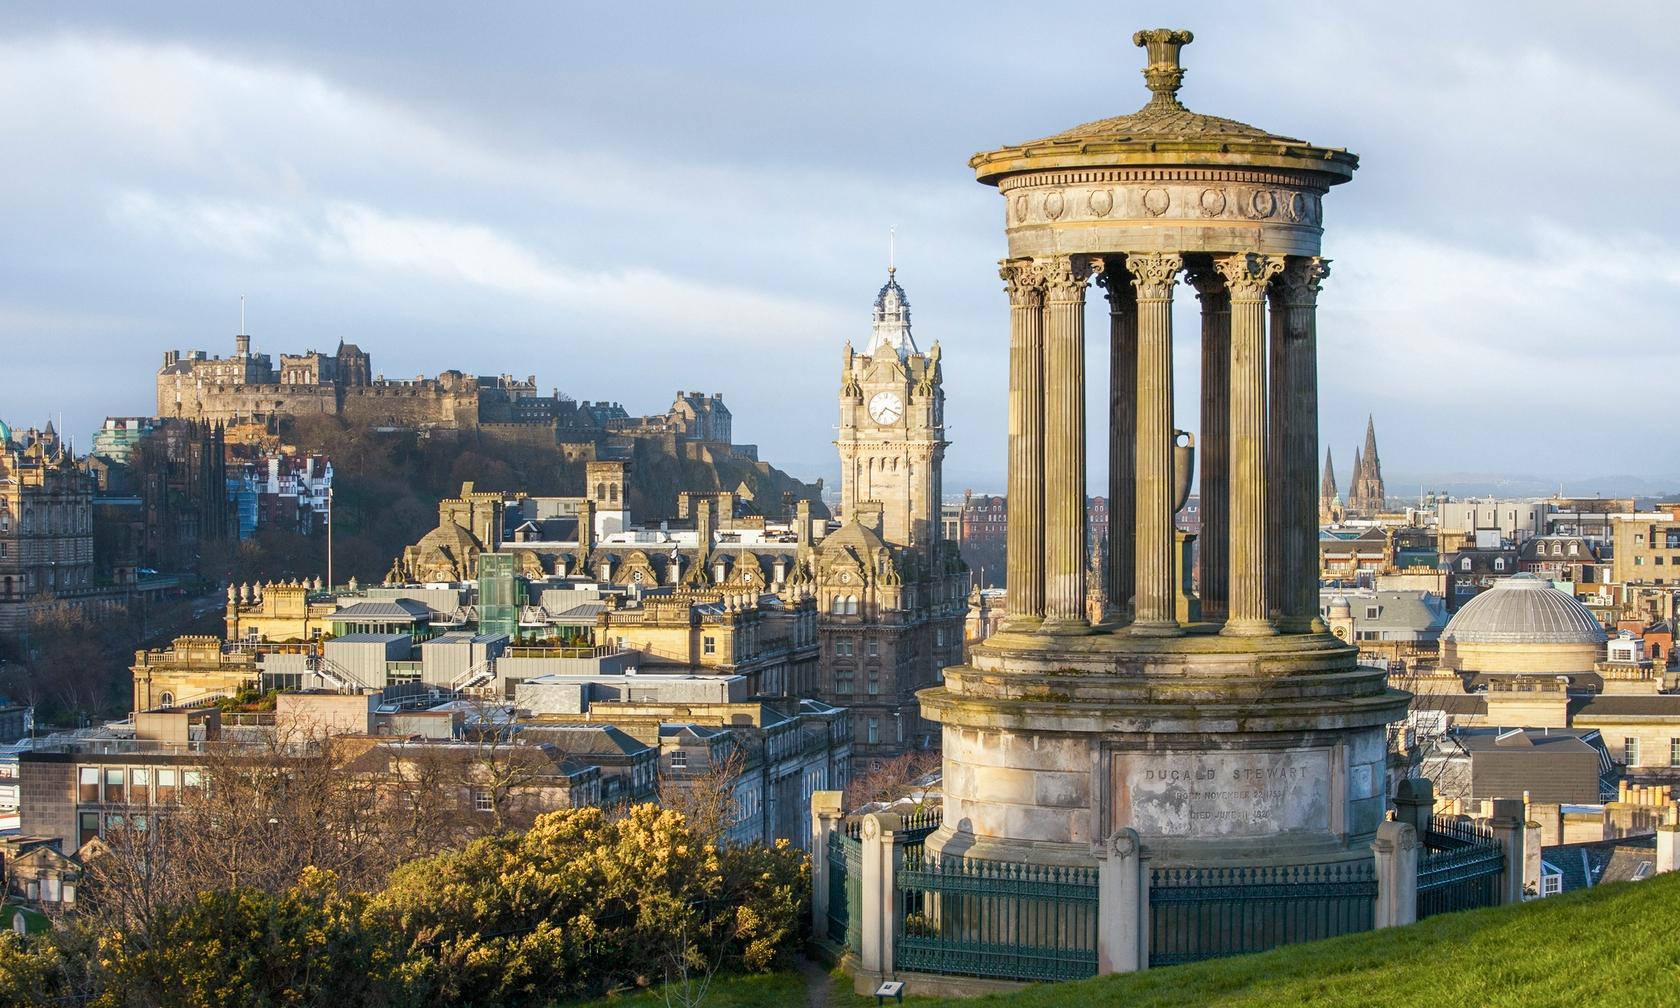 Holiday rentals in Edinburgh